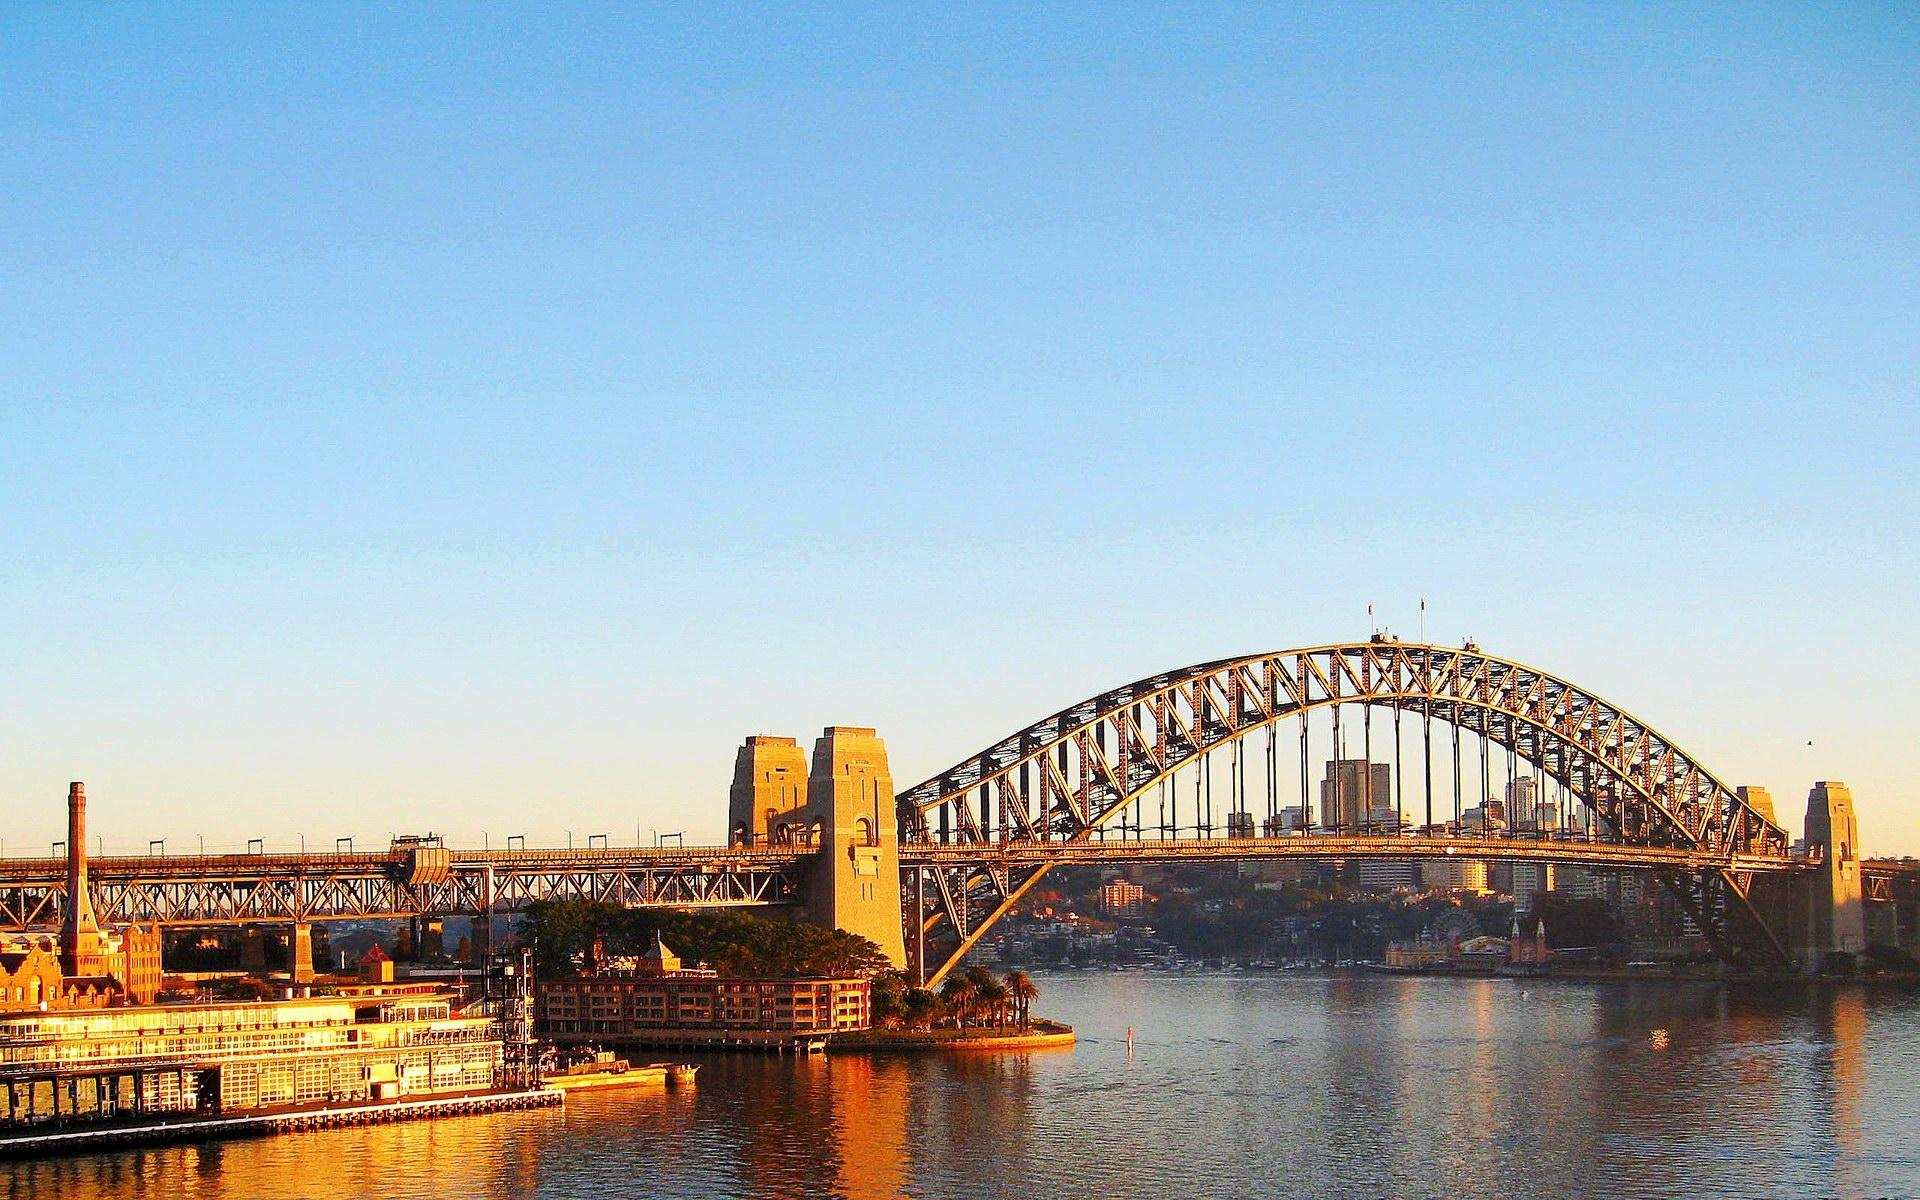 Sydney Harbour Bridge Holidays Wallpaper – Travel HD Wallpapers